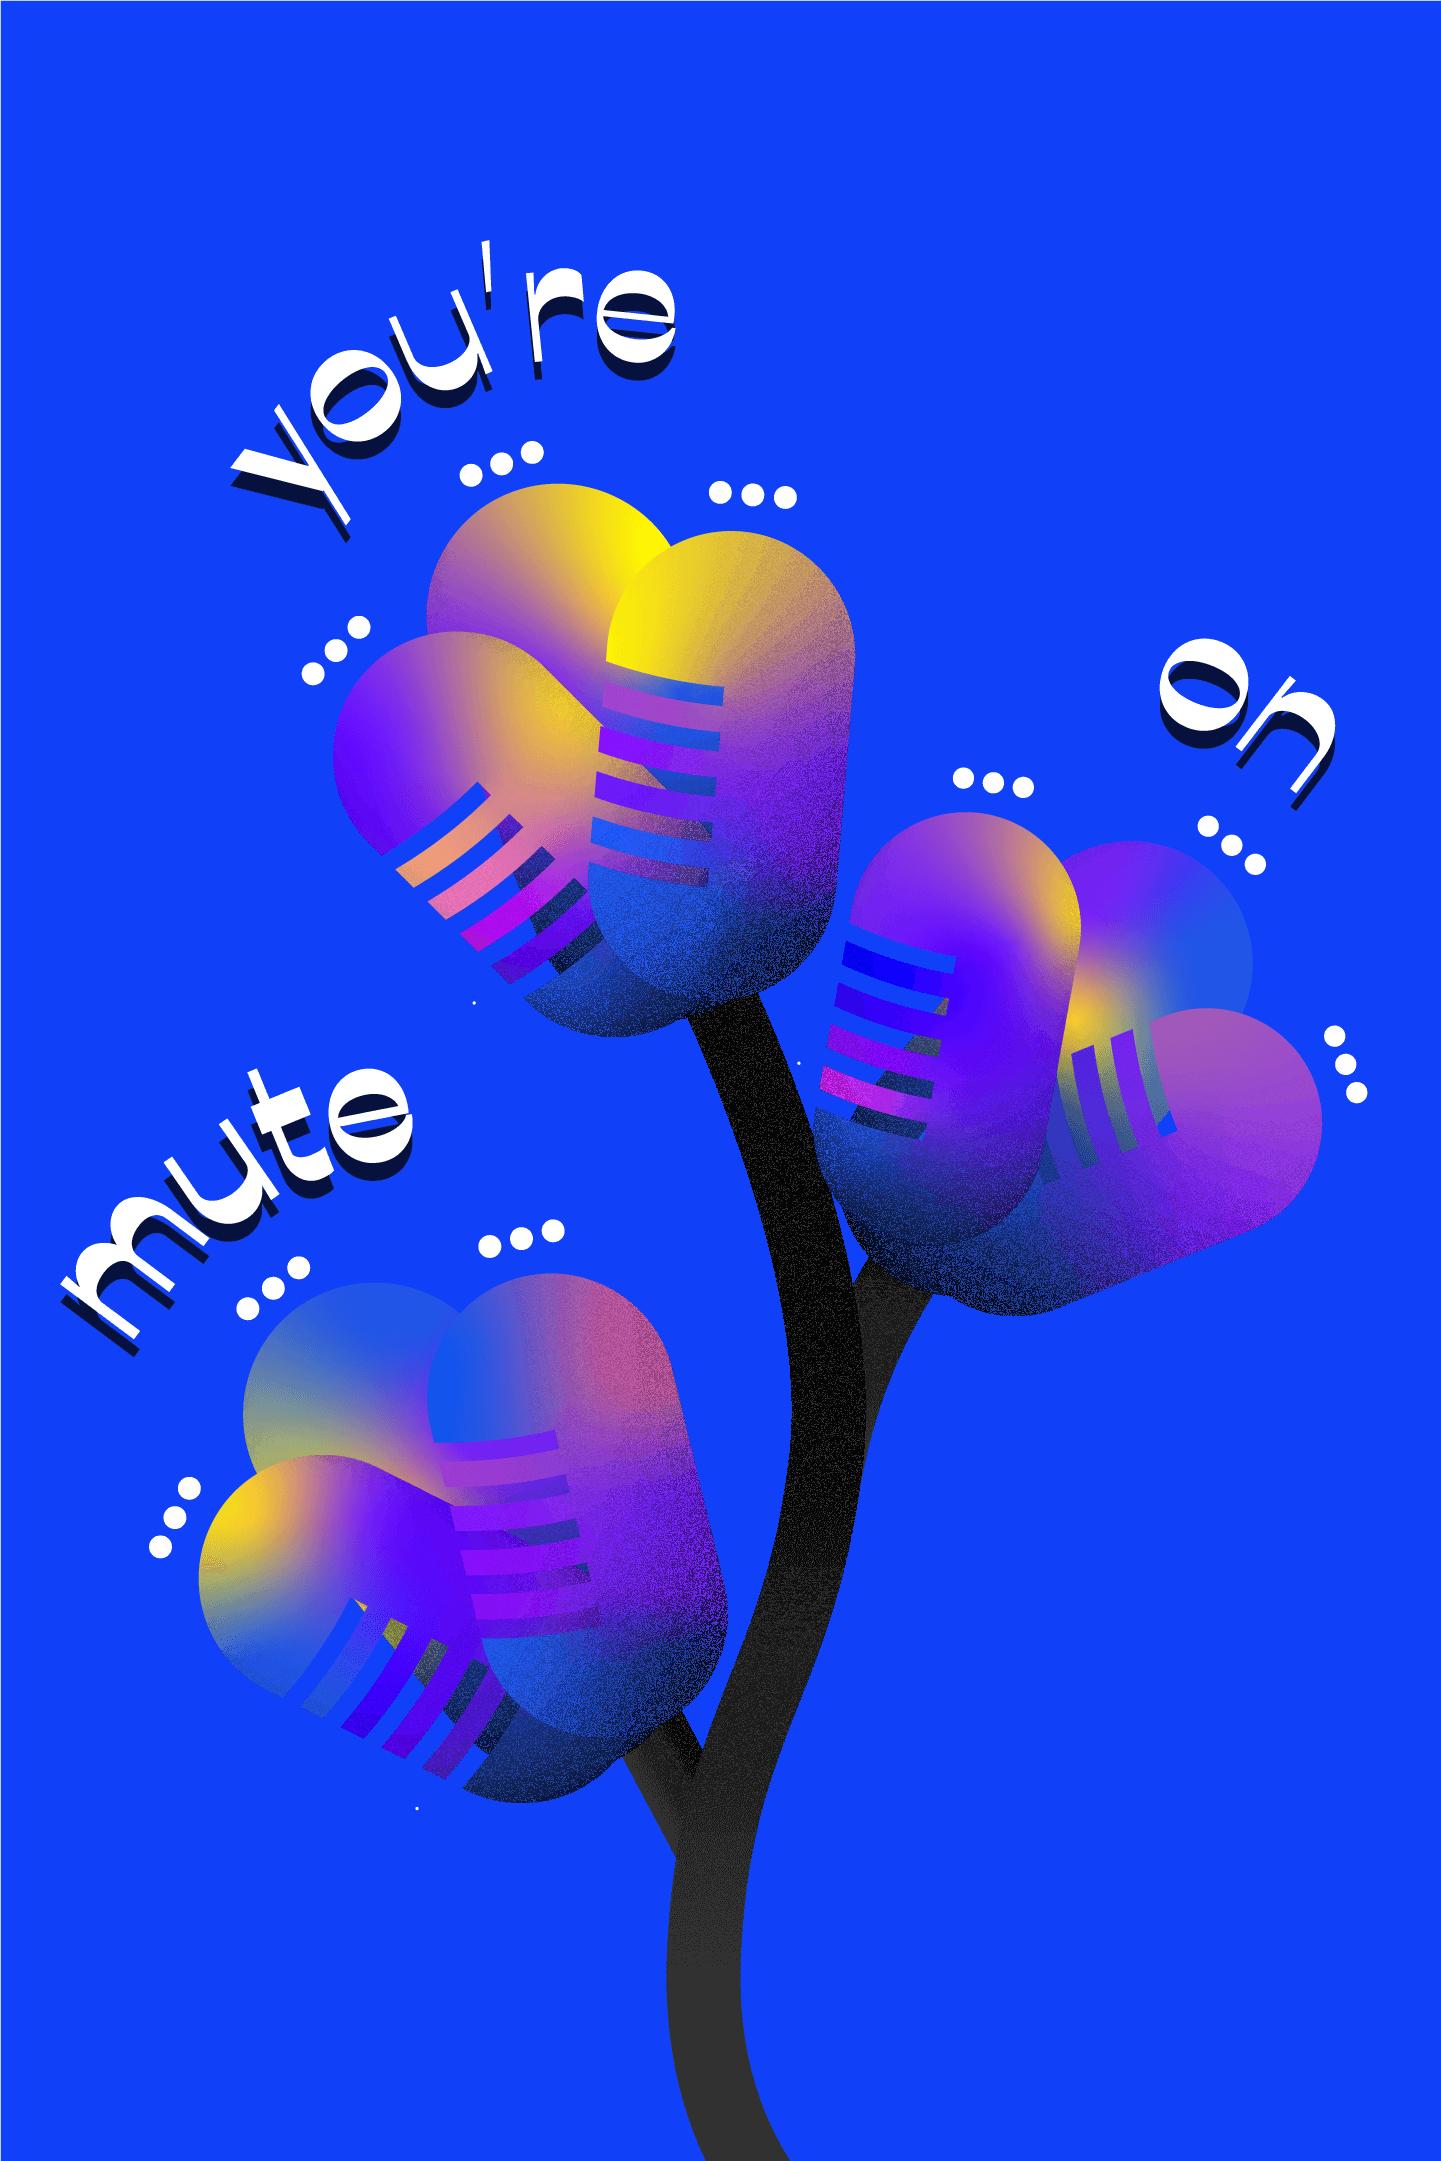 2019-03-agencylife-covid_v1-01-WEB